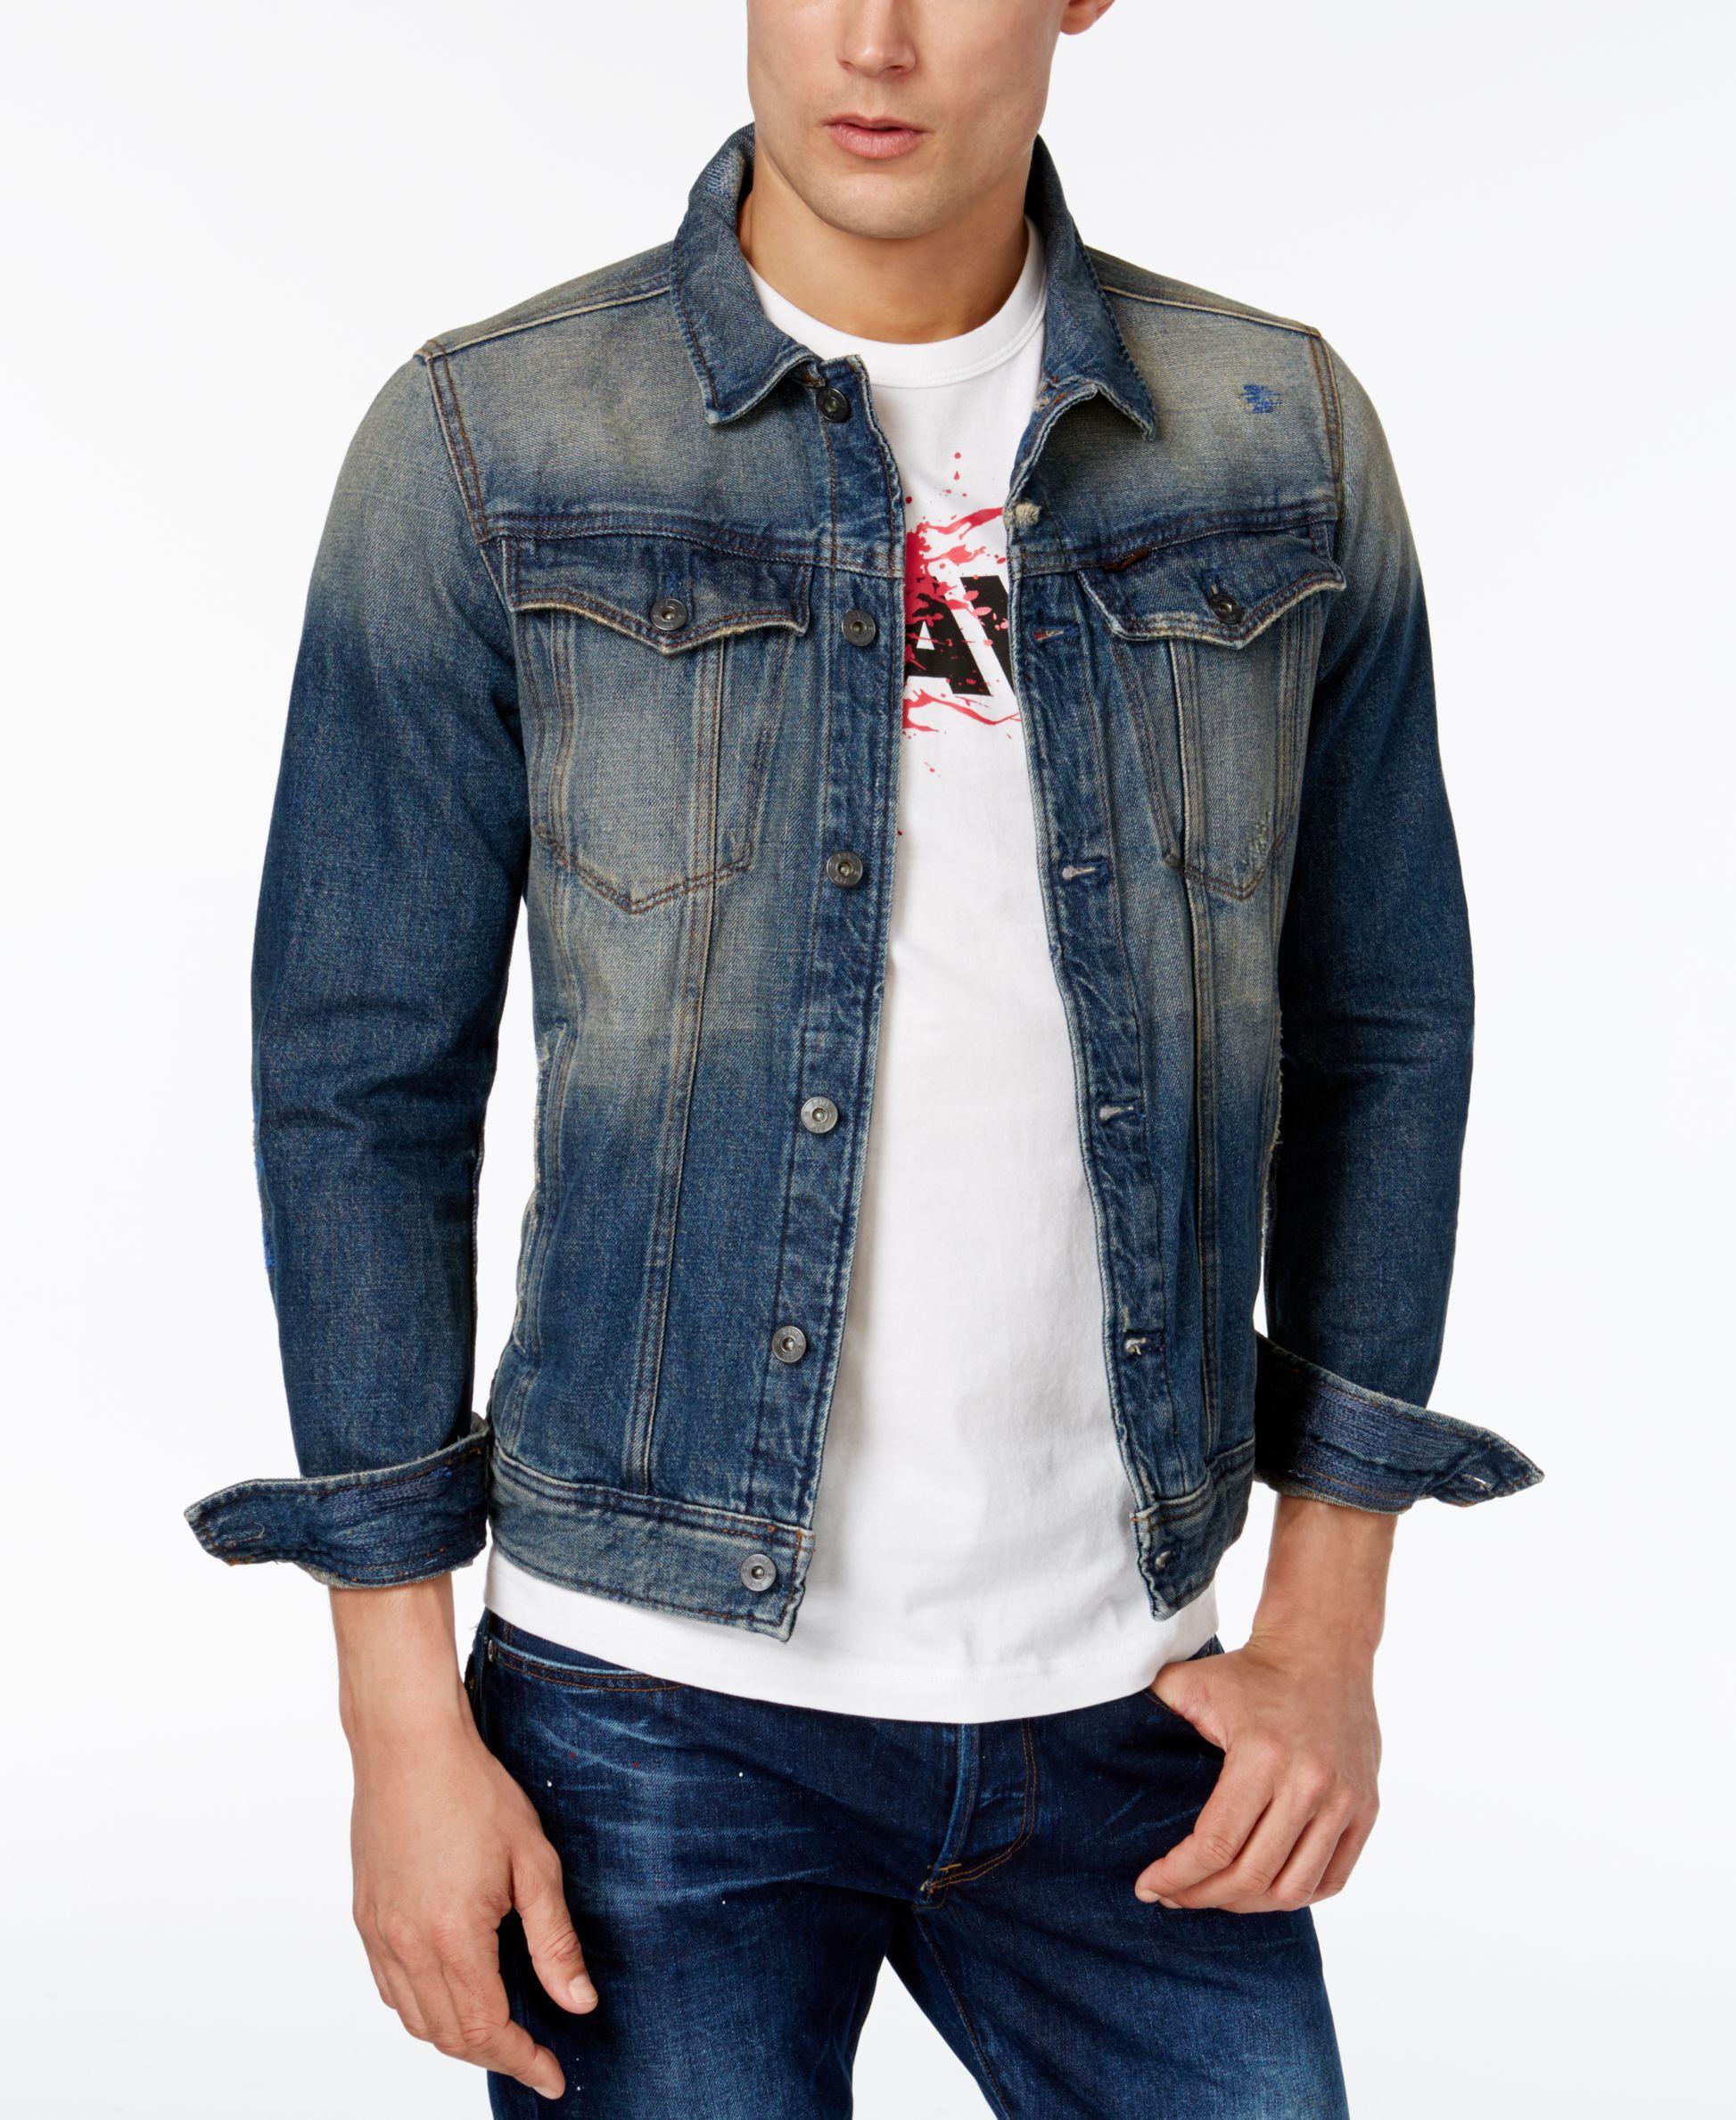 G Star Raw Men's Slim Fit Vintage Denim Jacket | Vintage